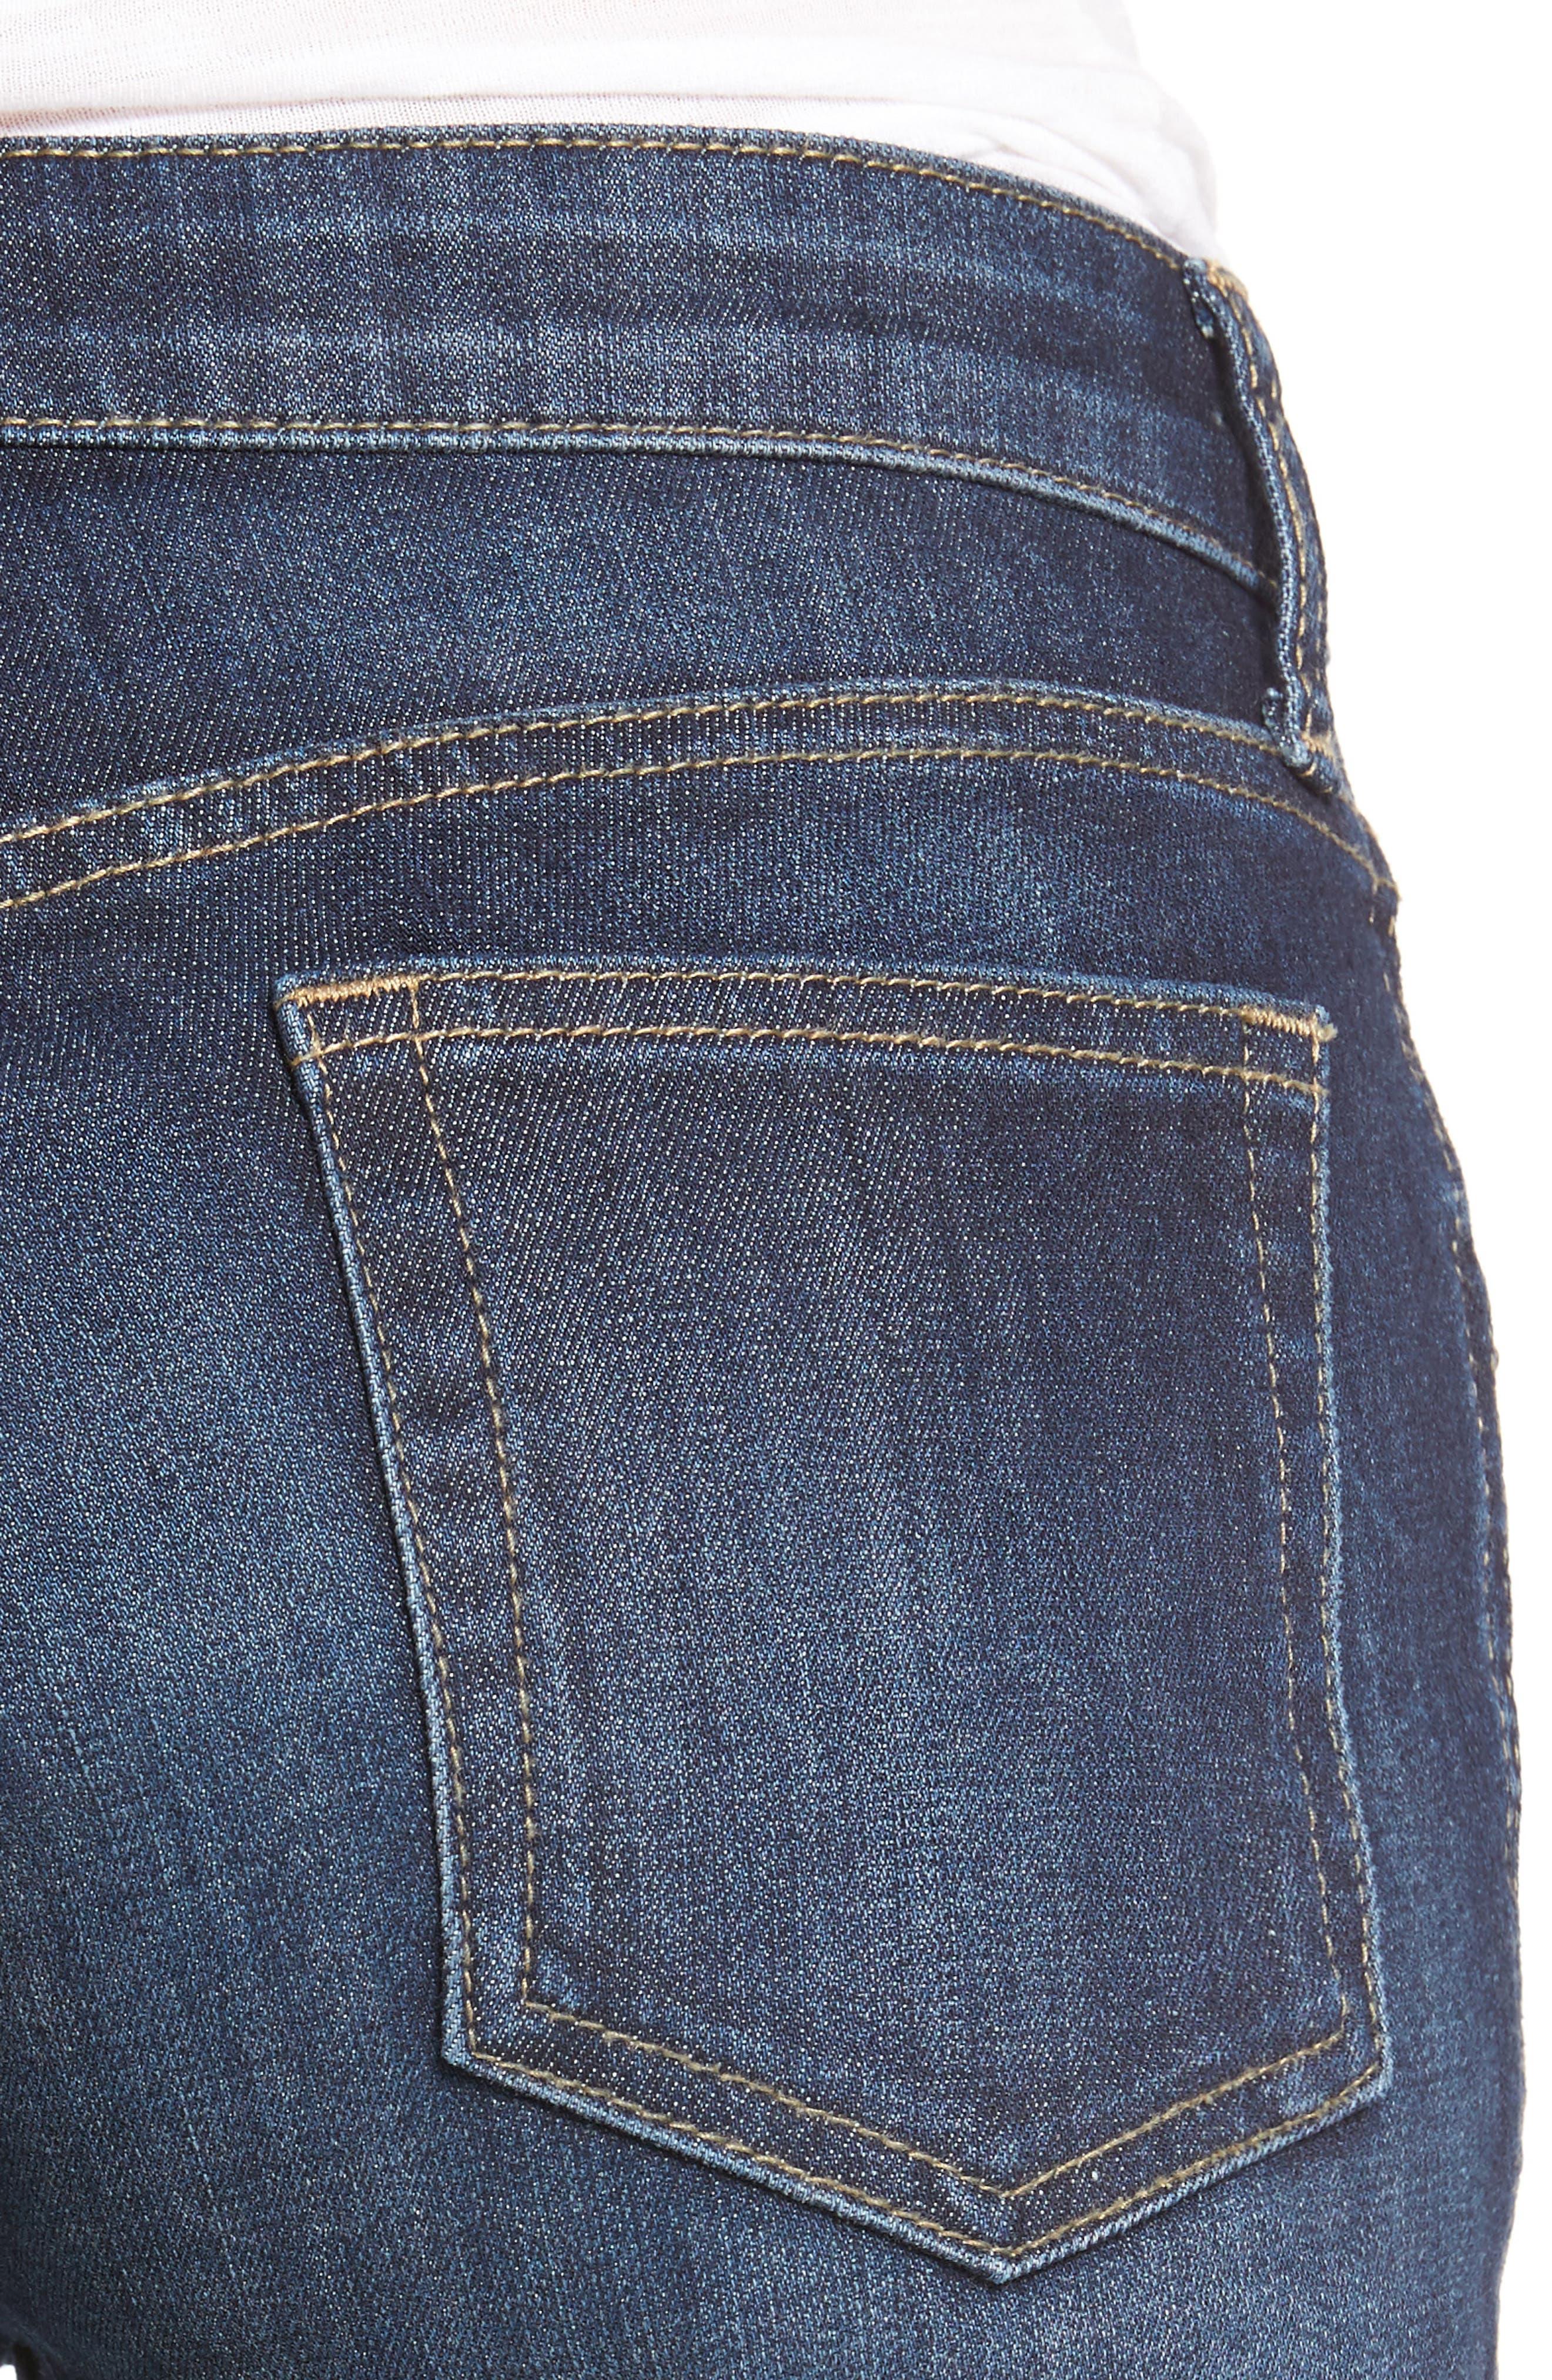 Gidget Denim Cutoff Shorts,                             Alternate thumbnail 4, color,                             STIMULATING